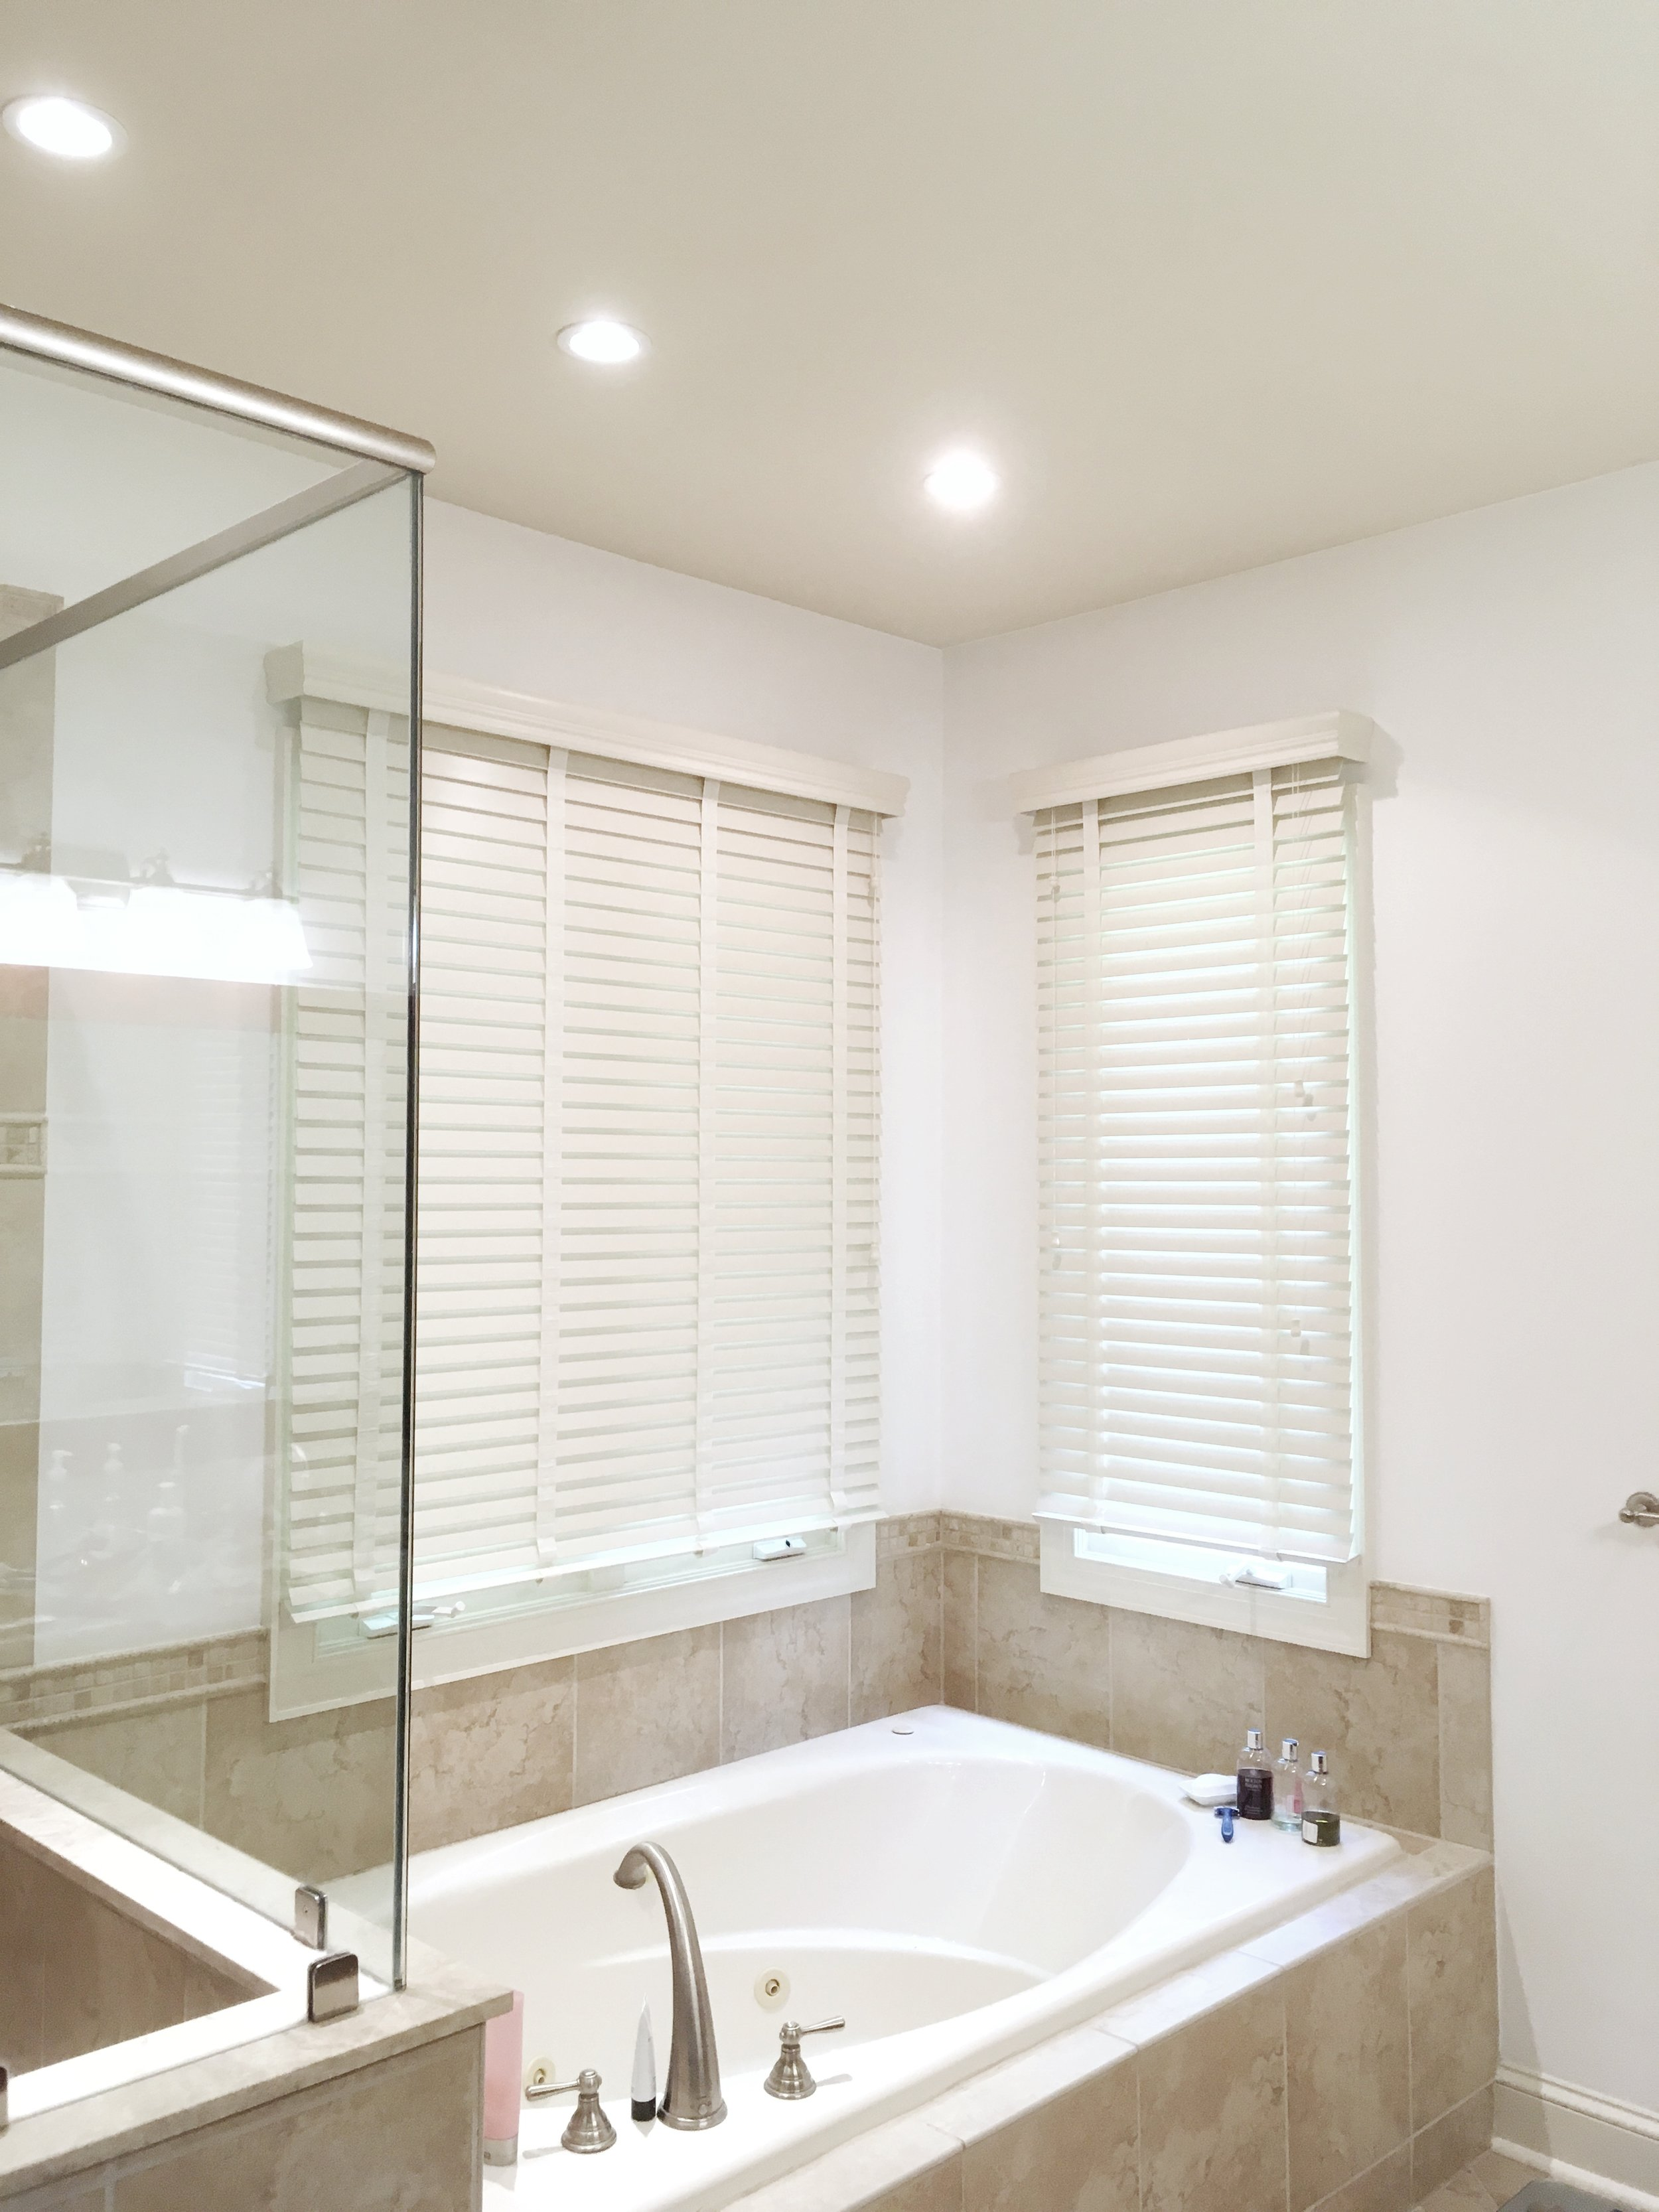 Bathroom with spa tub and 3rdGenBlinds custom window blinds